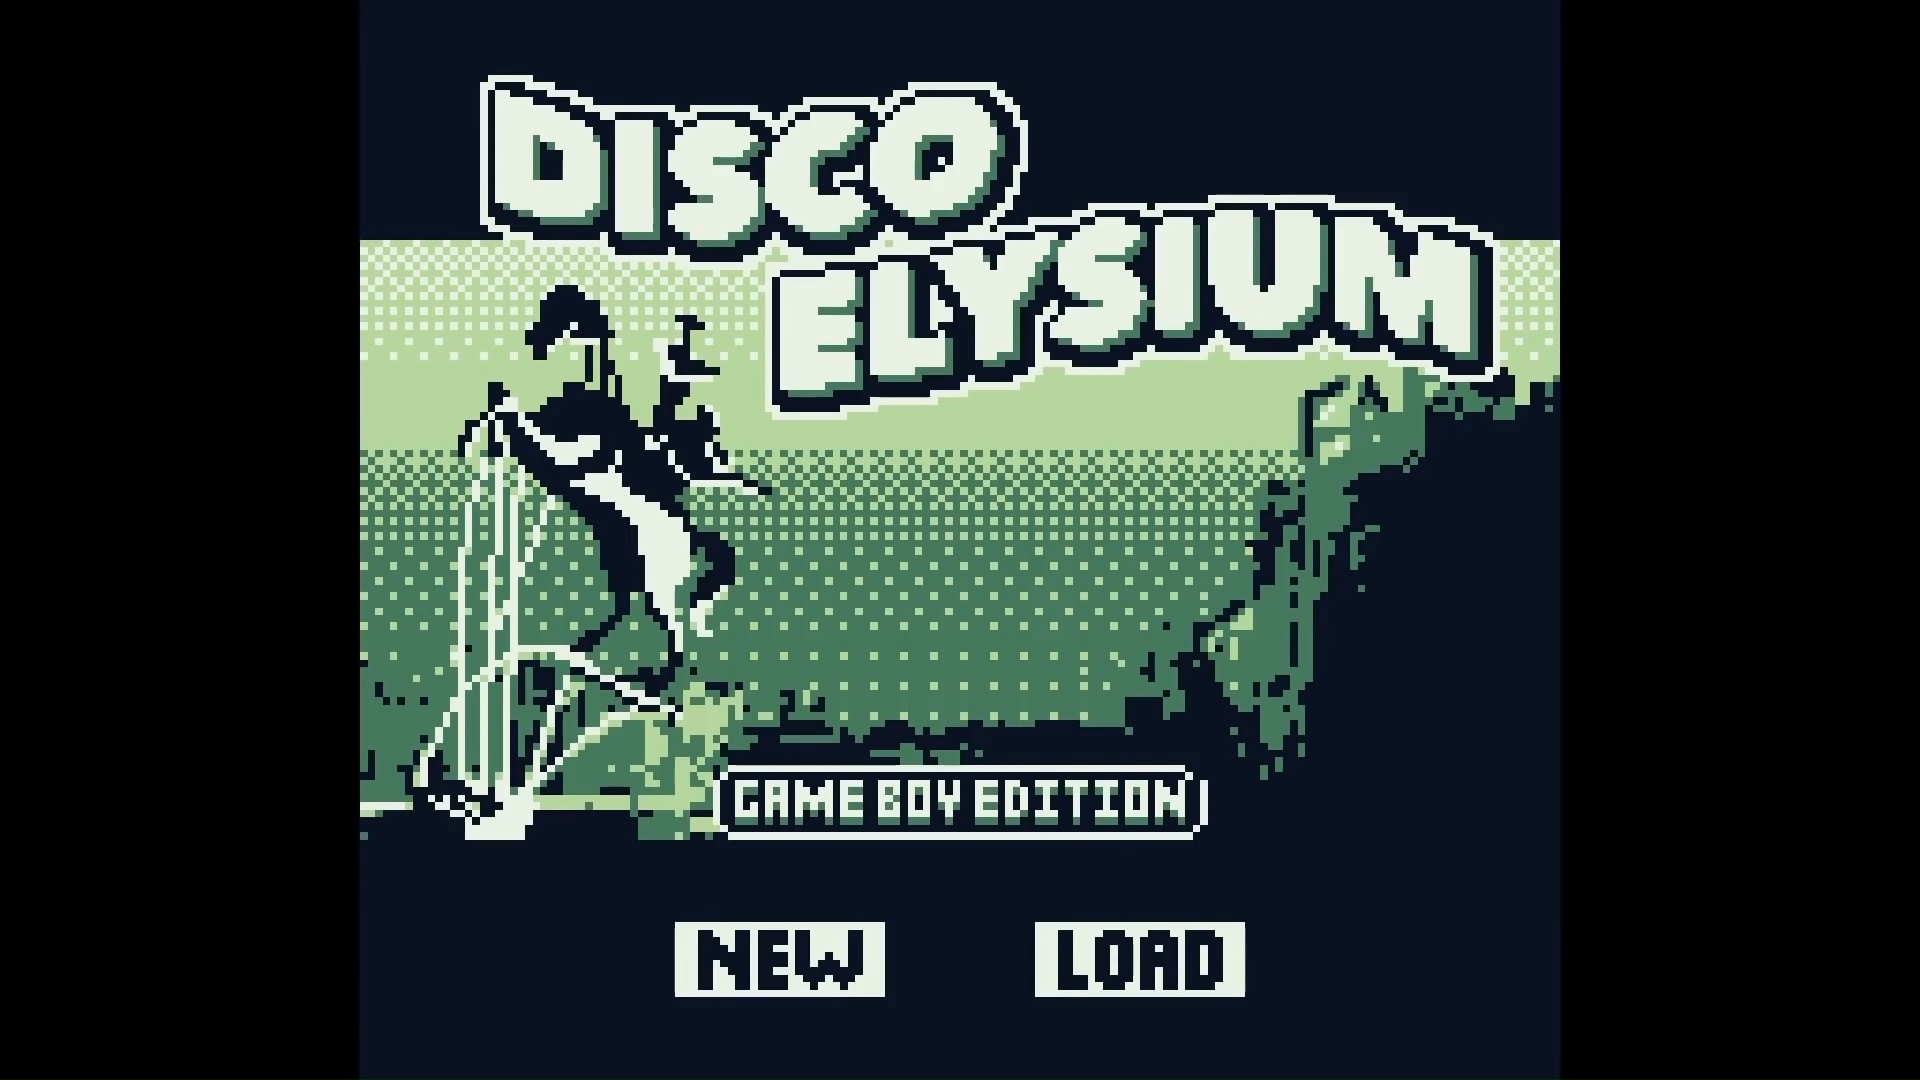 disco-elysium-gameboy-nintendon